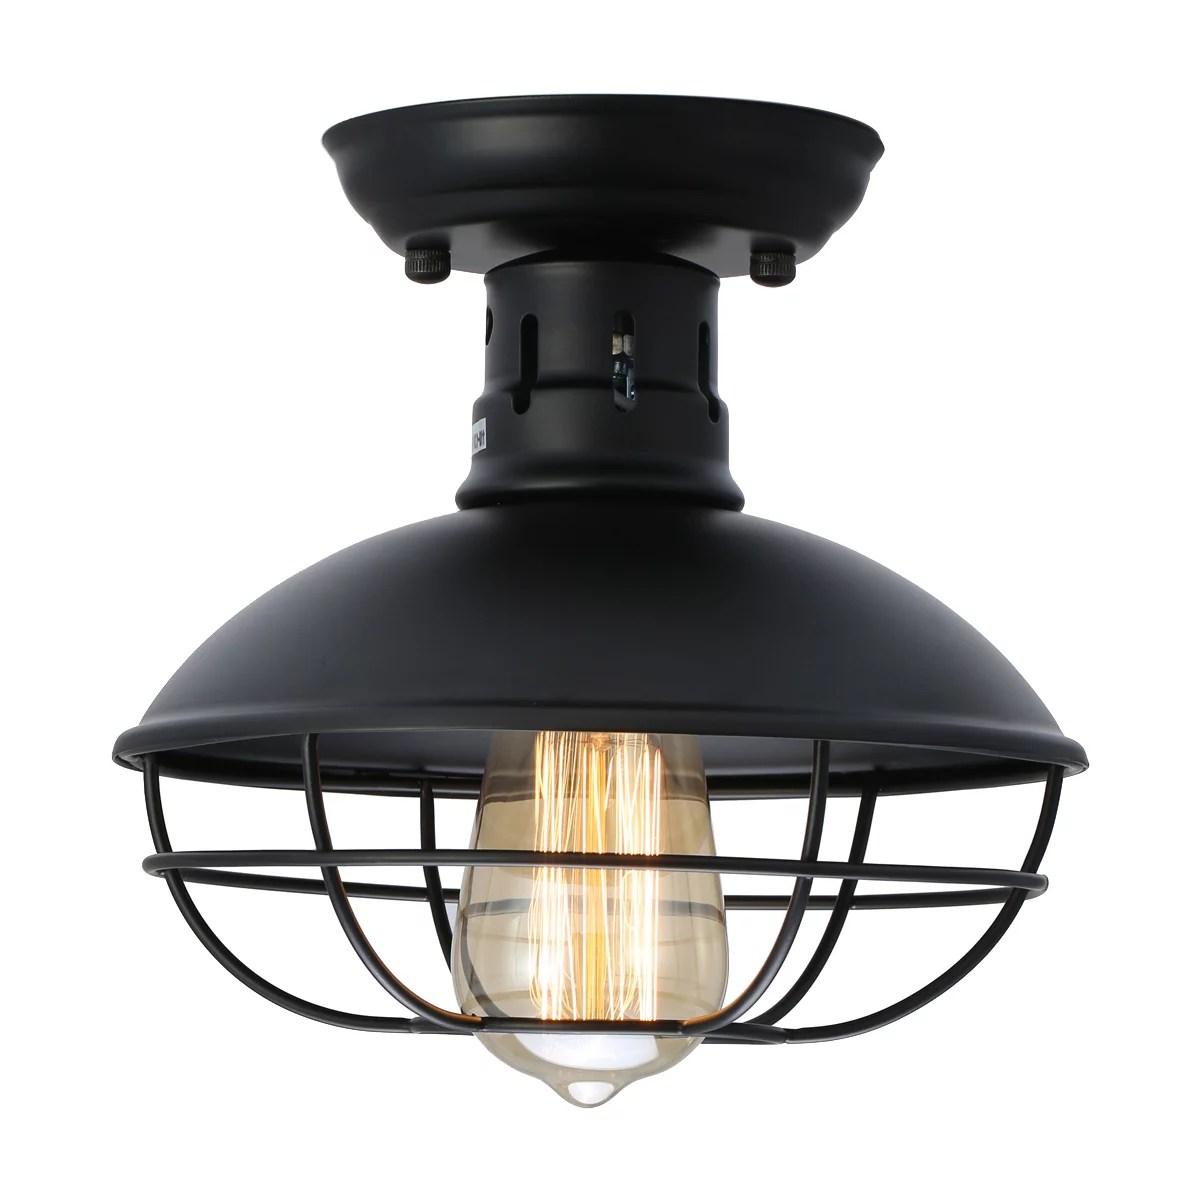 industrial metal cage ceiling light e26 rustic mini semi flush mounted pendant lighting dome bowl shaped lamp fixture farmhouse style for foyer